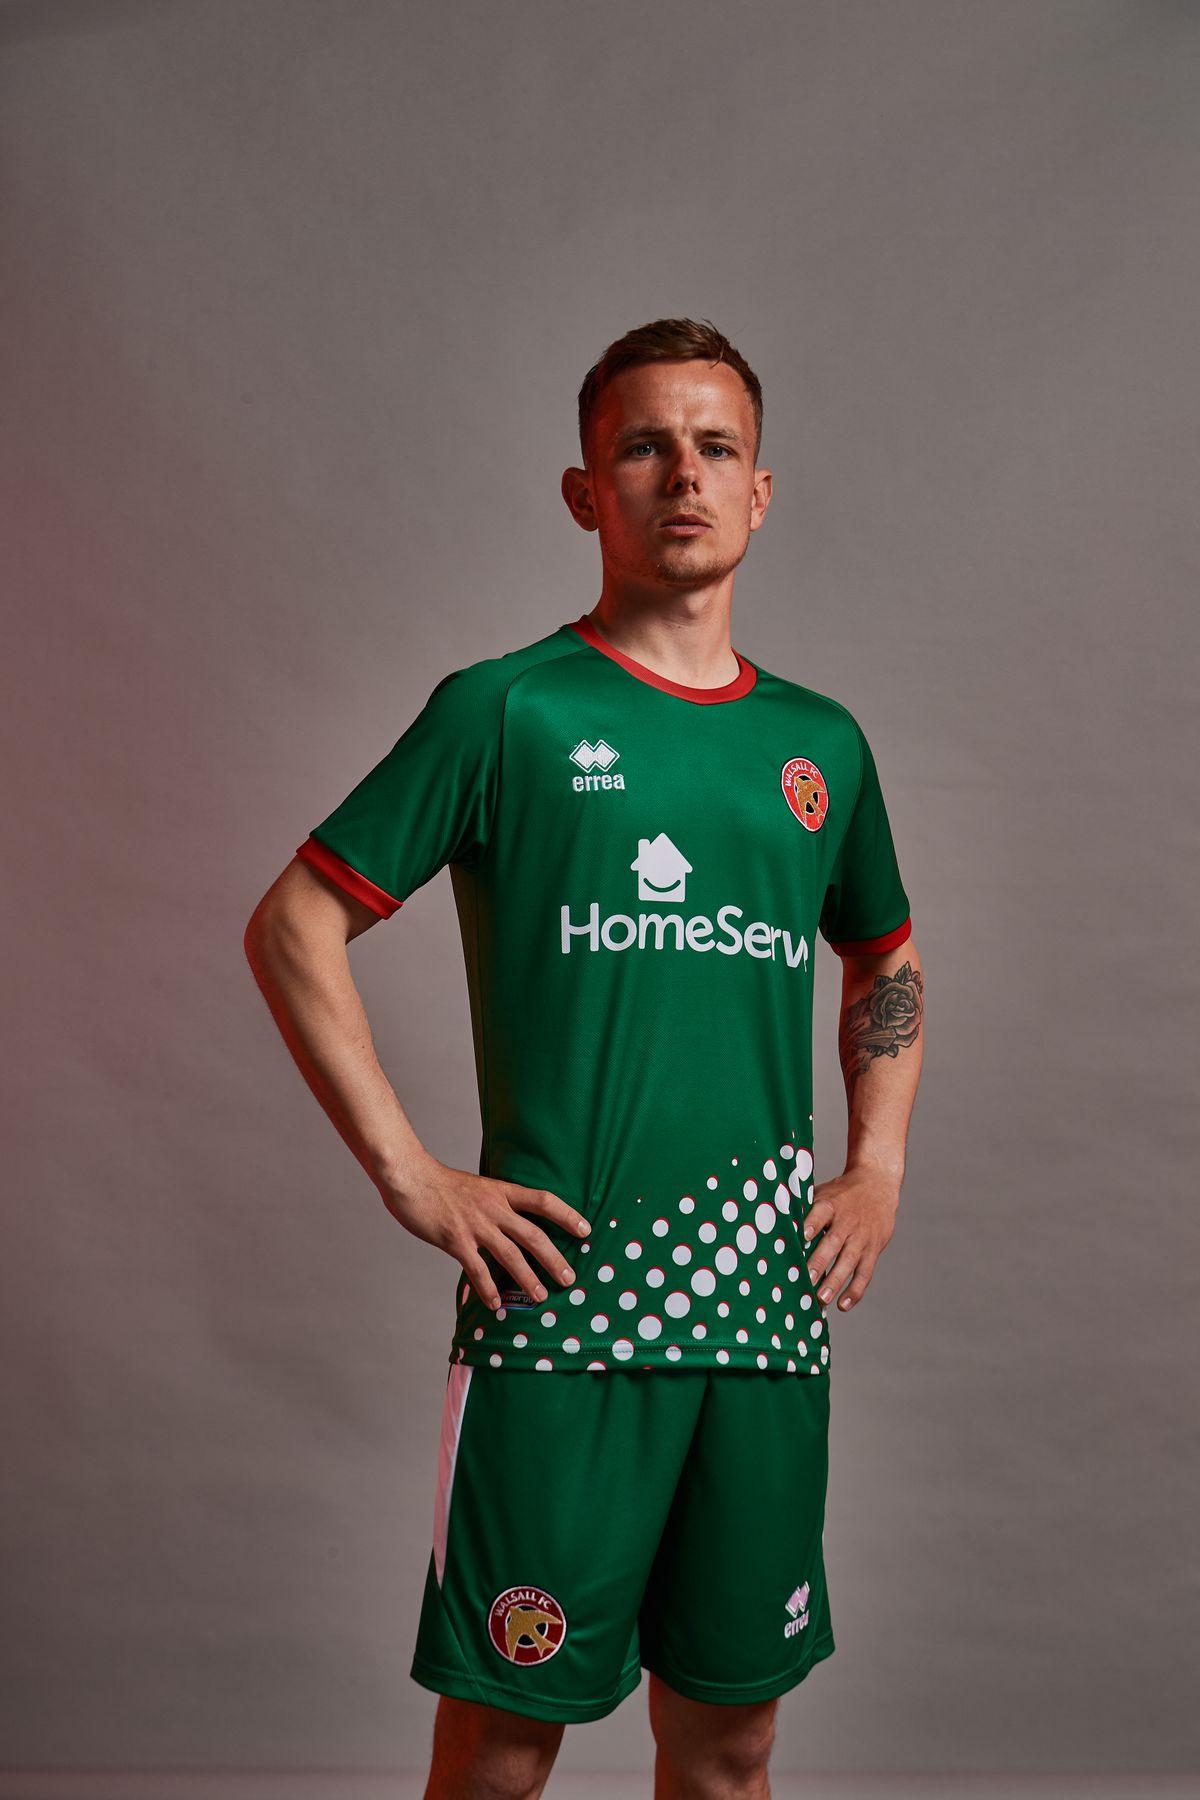 Liam Kinsella models the new away kit